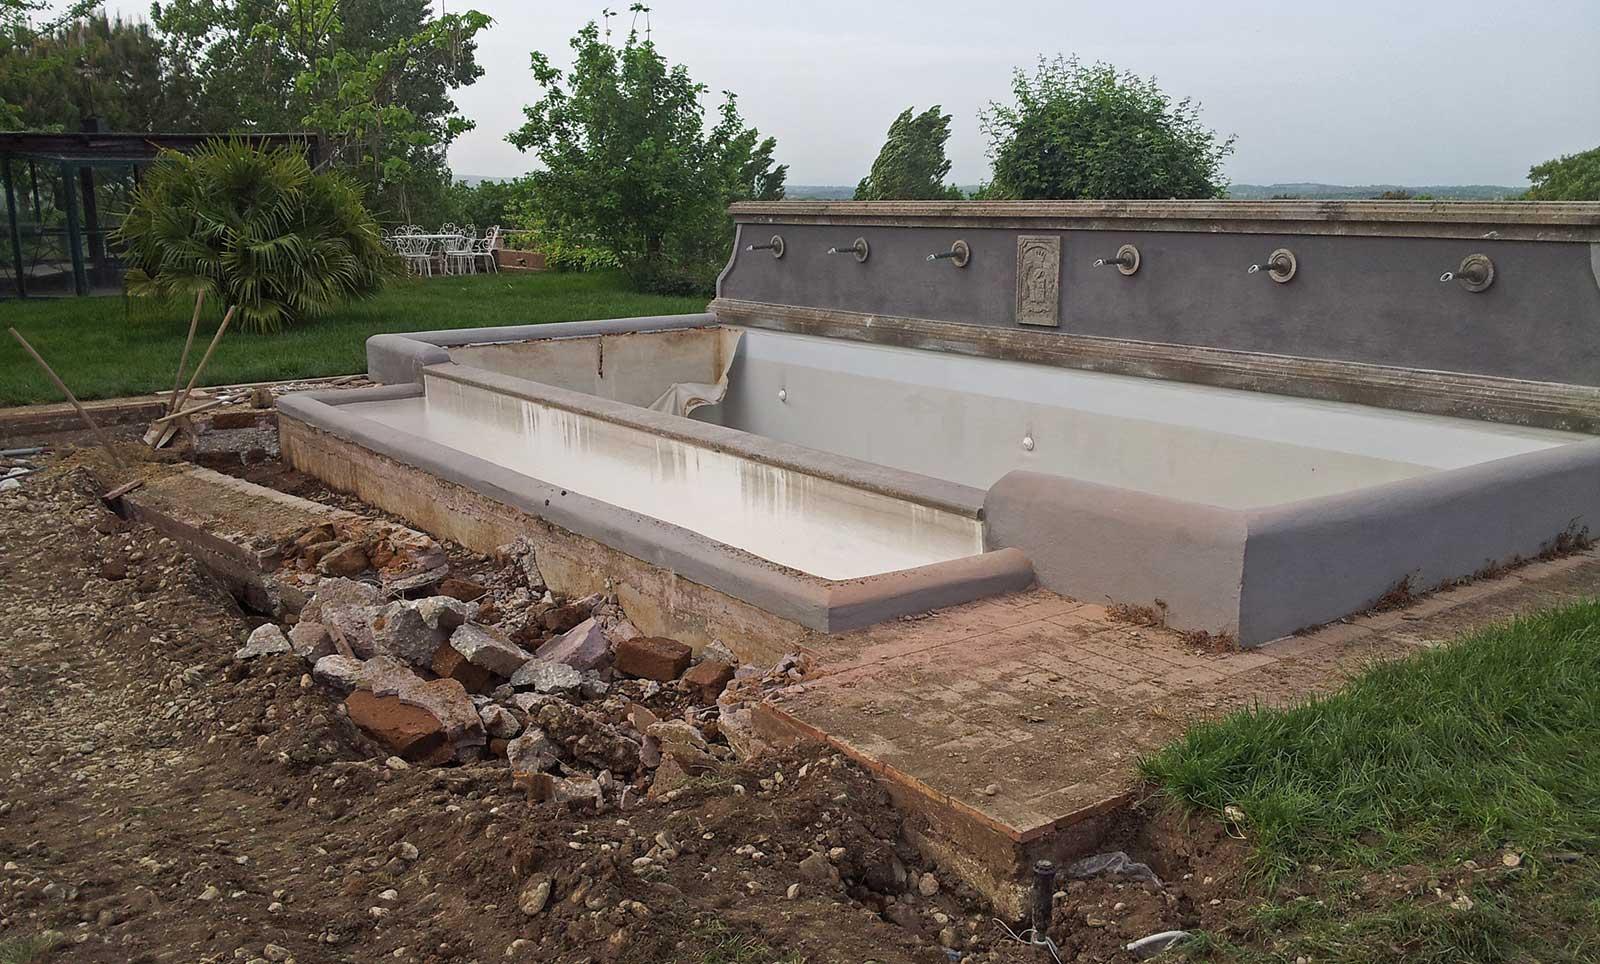 https://gajarda.com/wp-content/uploads/2019/11/piscine-ristrutturazioni-home04.jpg